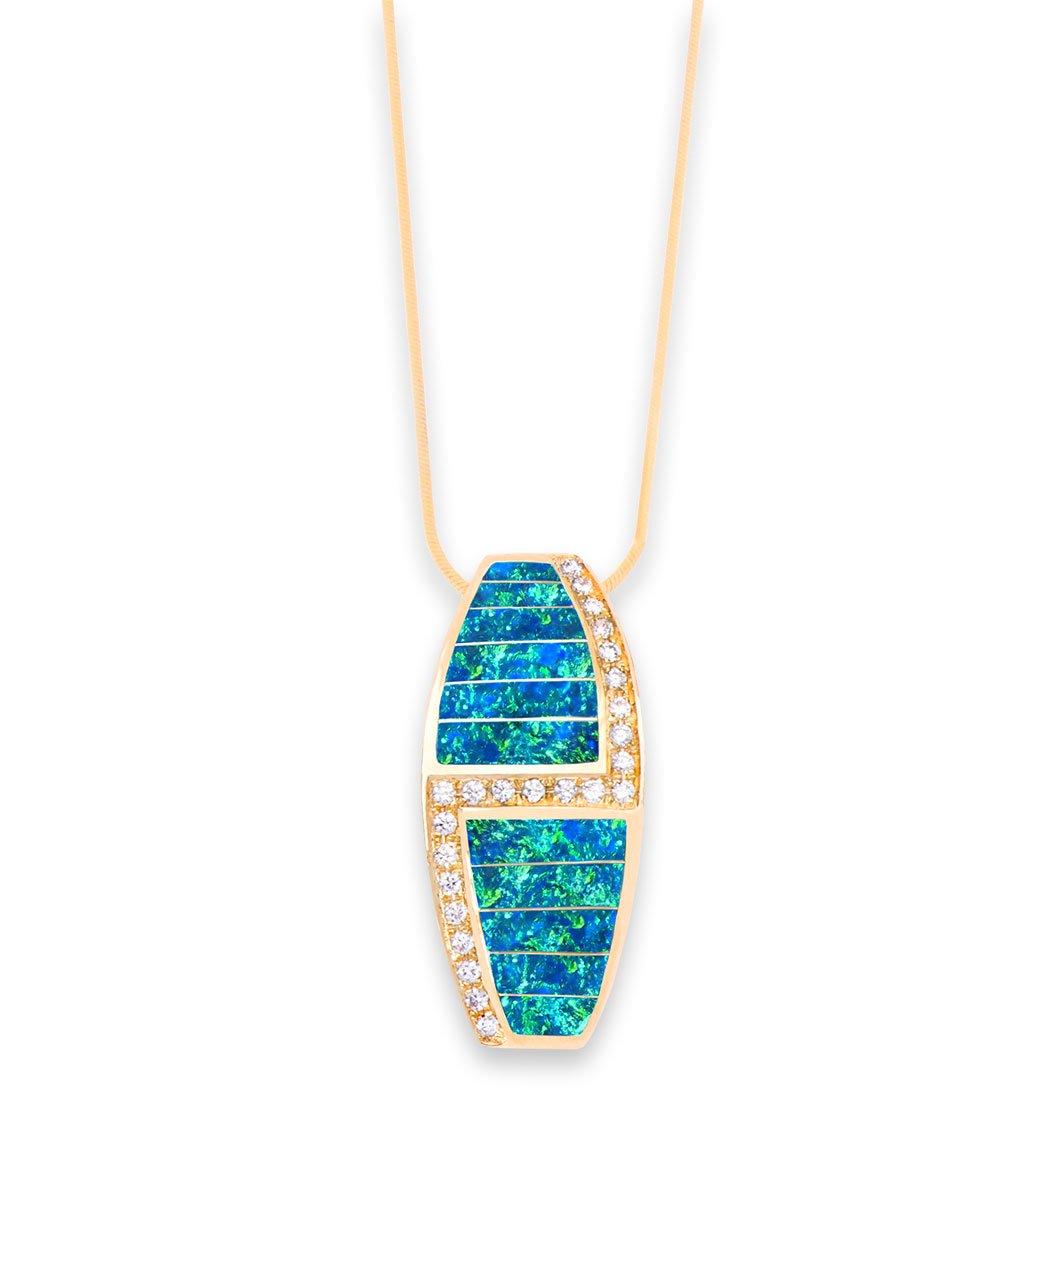 Maverick's - Opal, Diamond, 14K Gold Pendant